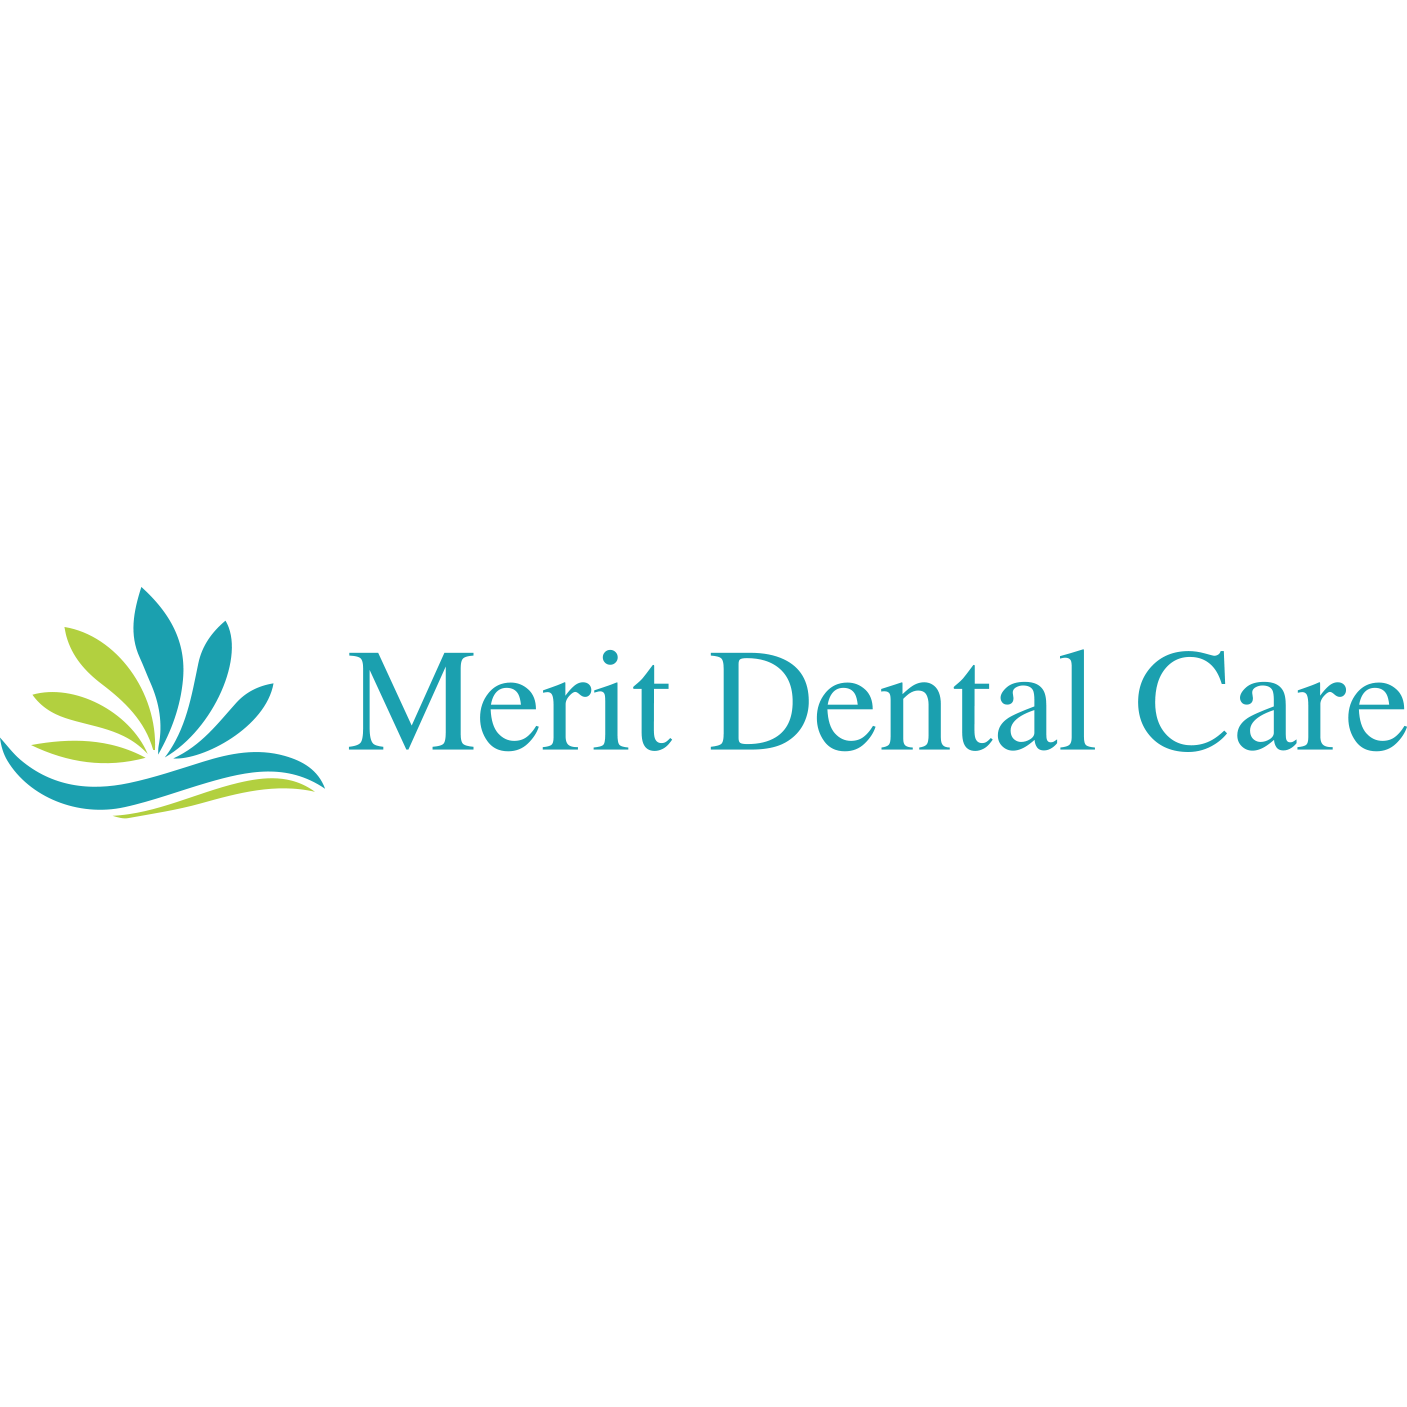 Merit Dental Care